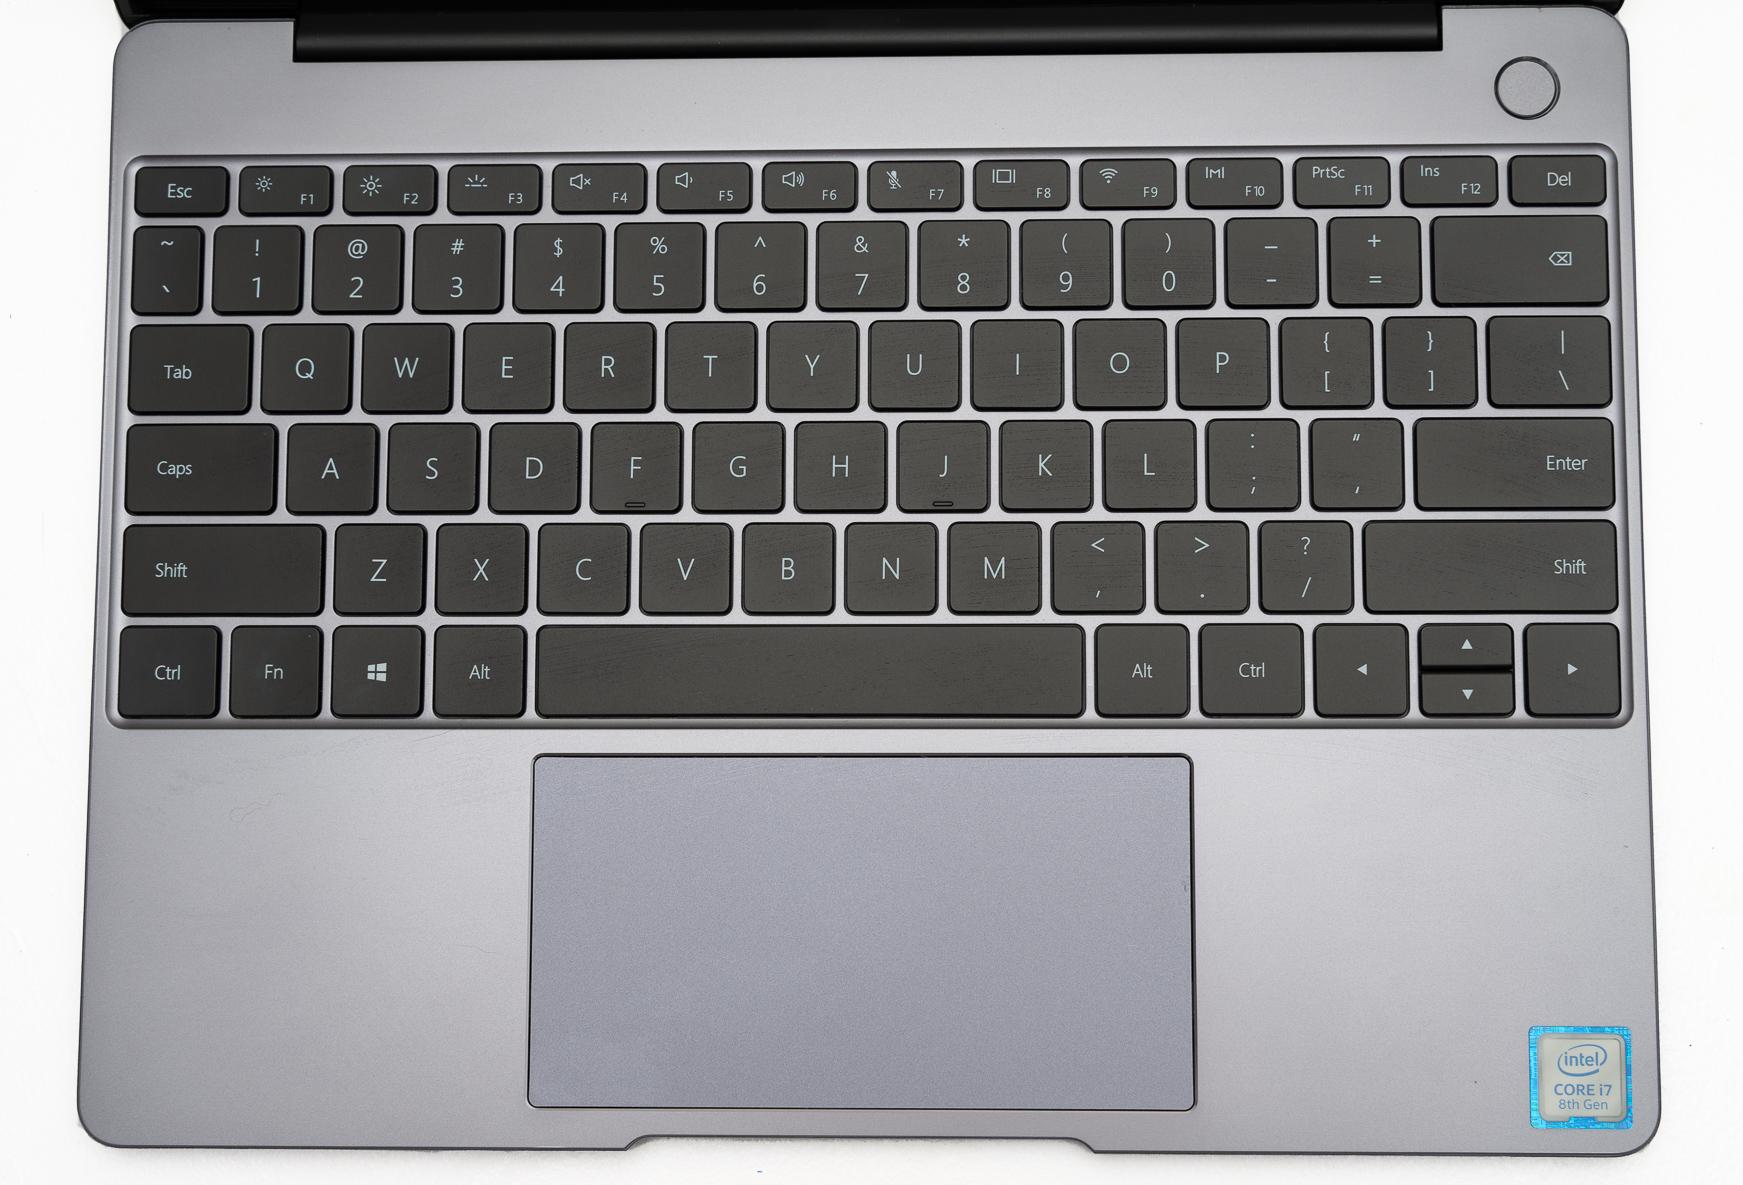 Huawei Matebook 13 keybaord